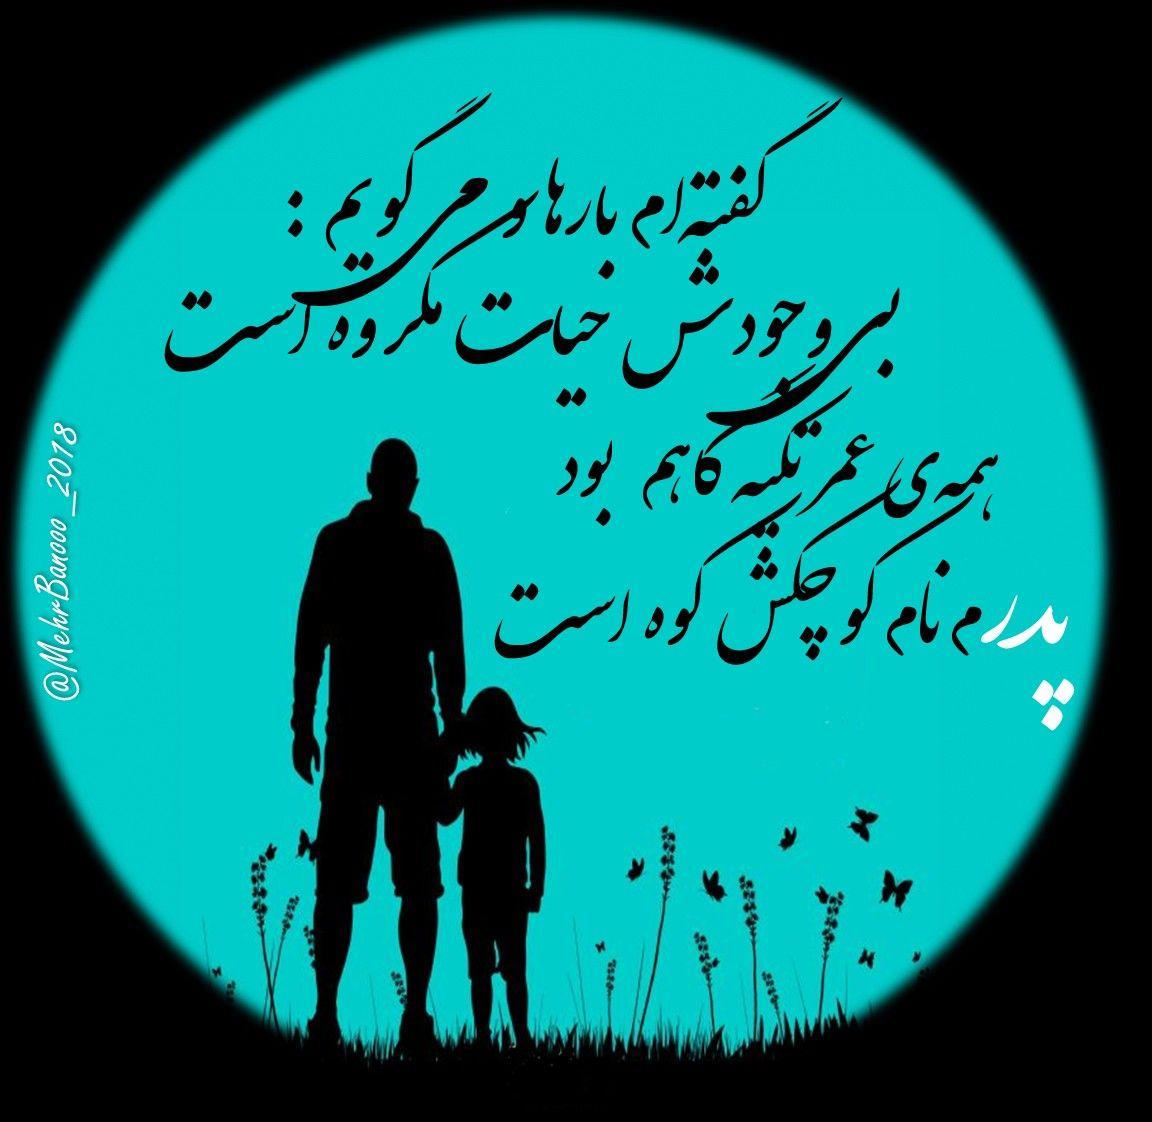 عکس نوشته عکس پروفایل پدر کانال تلگرام مهر بانو ۲۰۱۸ Mehrbanooo 2018 In 2021